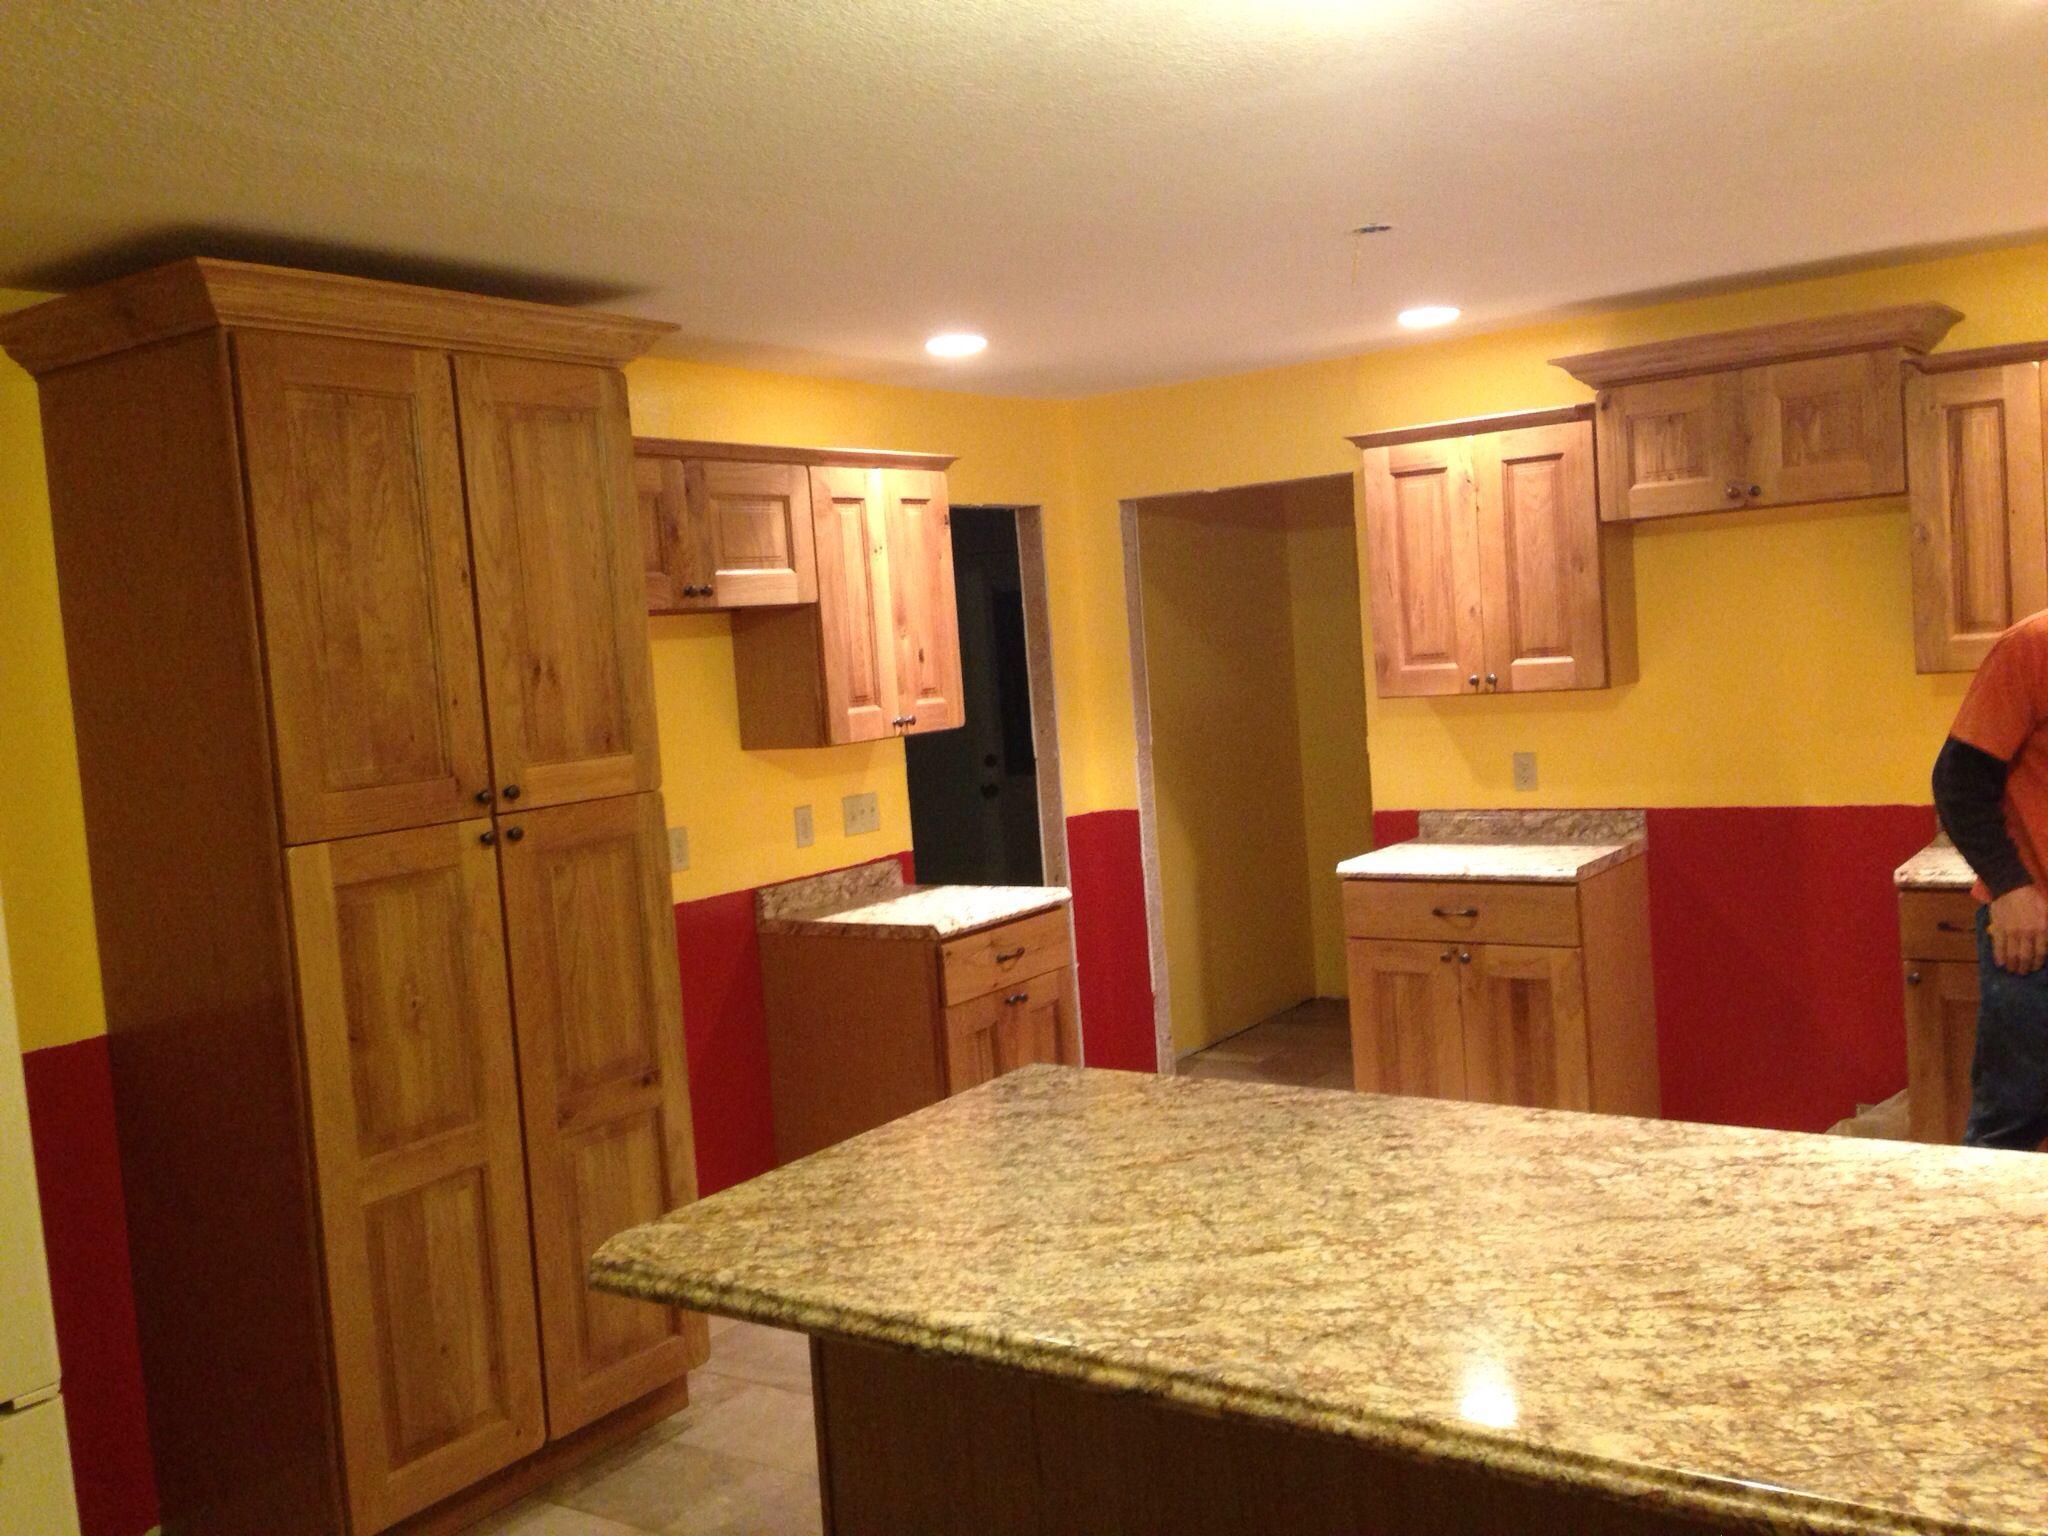 Rustic Knotty Oak Kitchen Cabinets